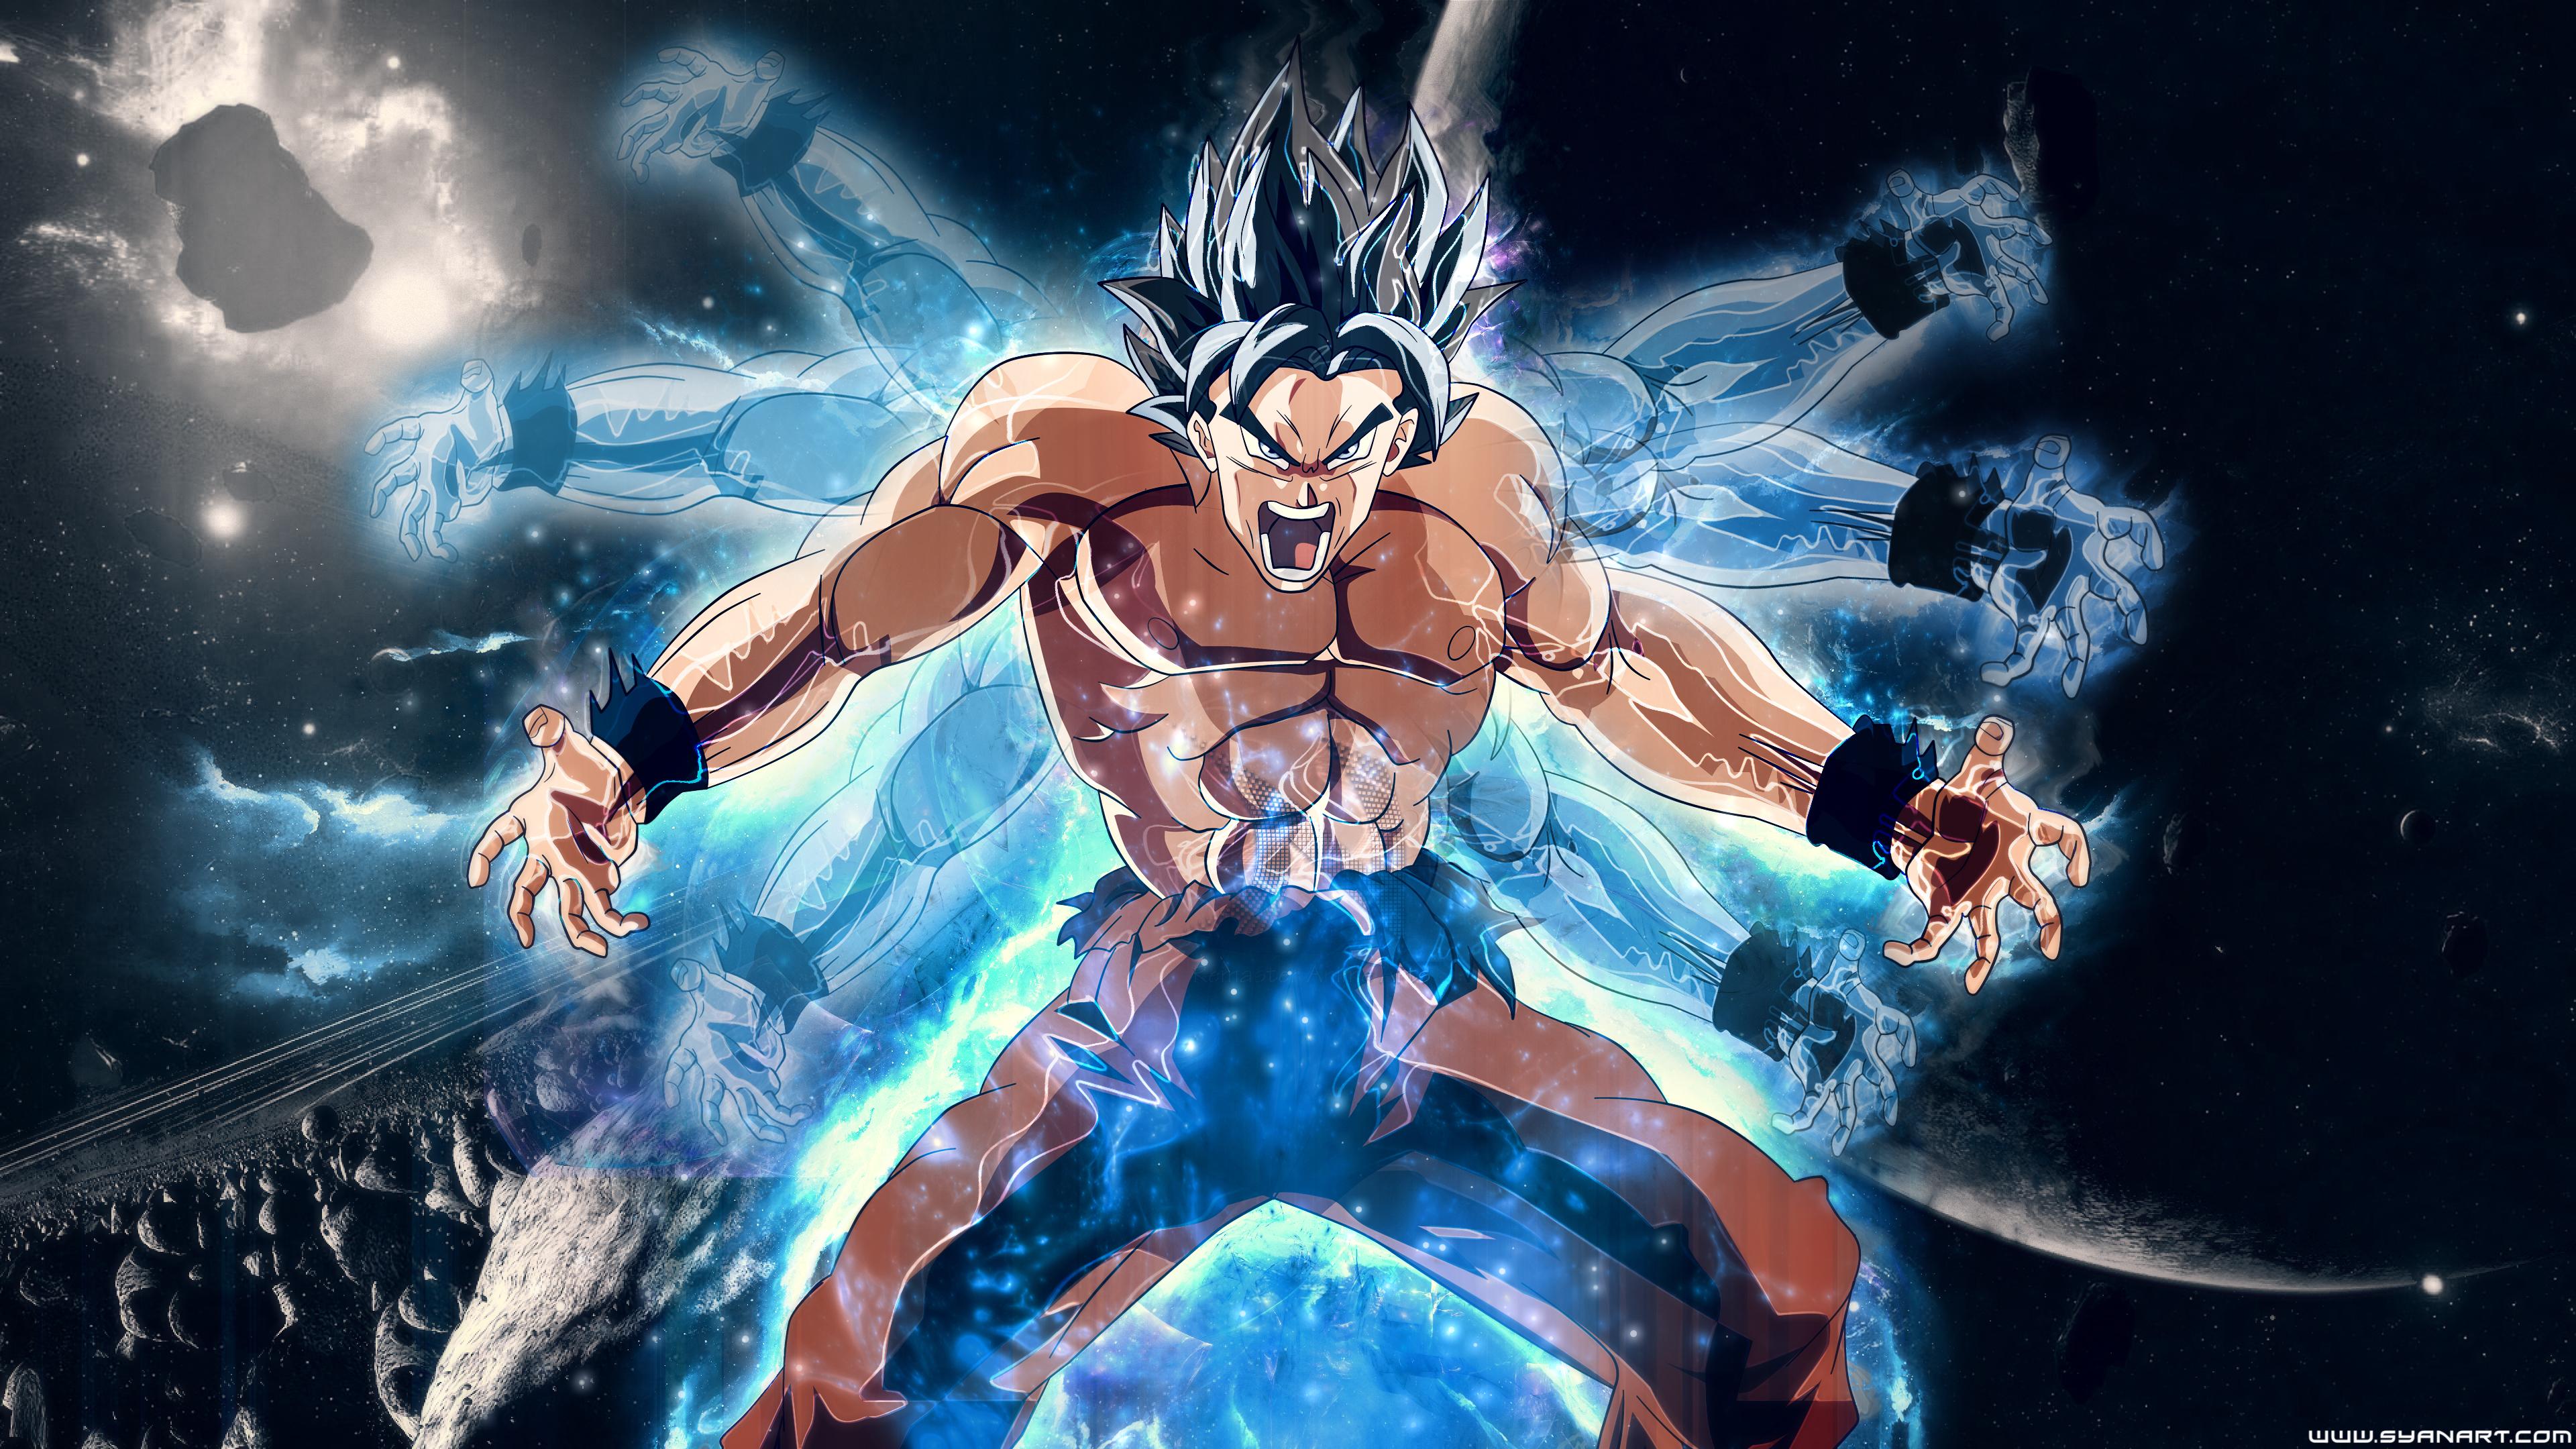 dragon ball super goku 4k 1541973719 - Dragon Ball Super Goku 4k - hd-wallpapers, goku wallpapers, dragon ball wallpapers, dragon ball super wallpapers, digital art wallpapers, artwork wallpapers, artist wallpapers, anime wallpapers, 4k-wallpapers